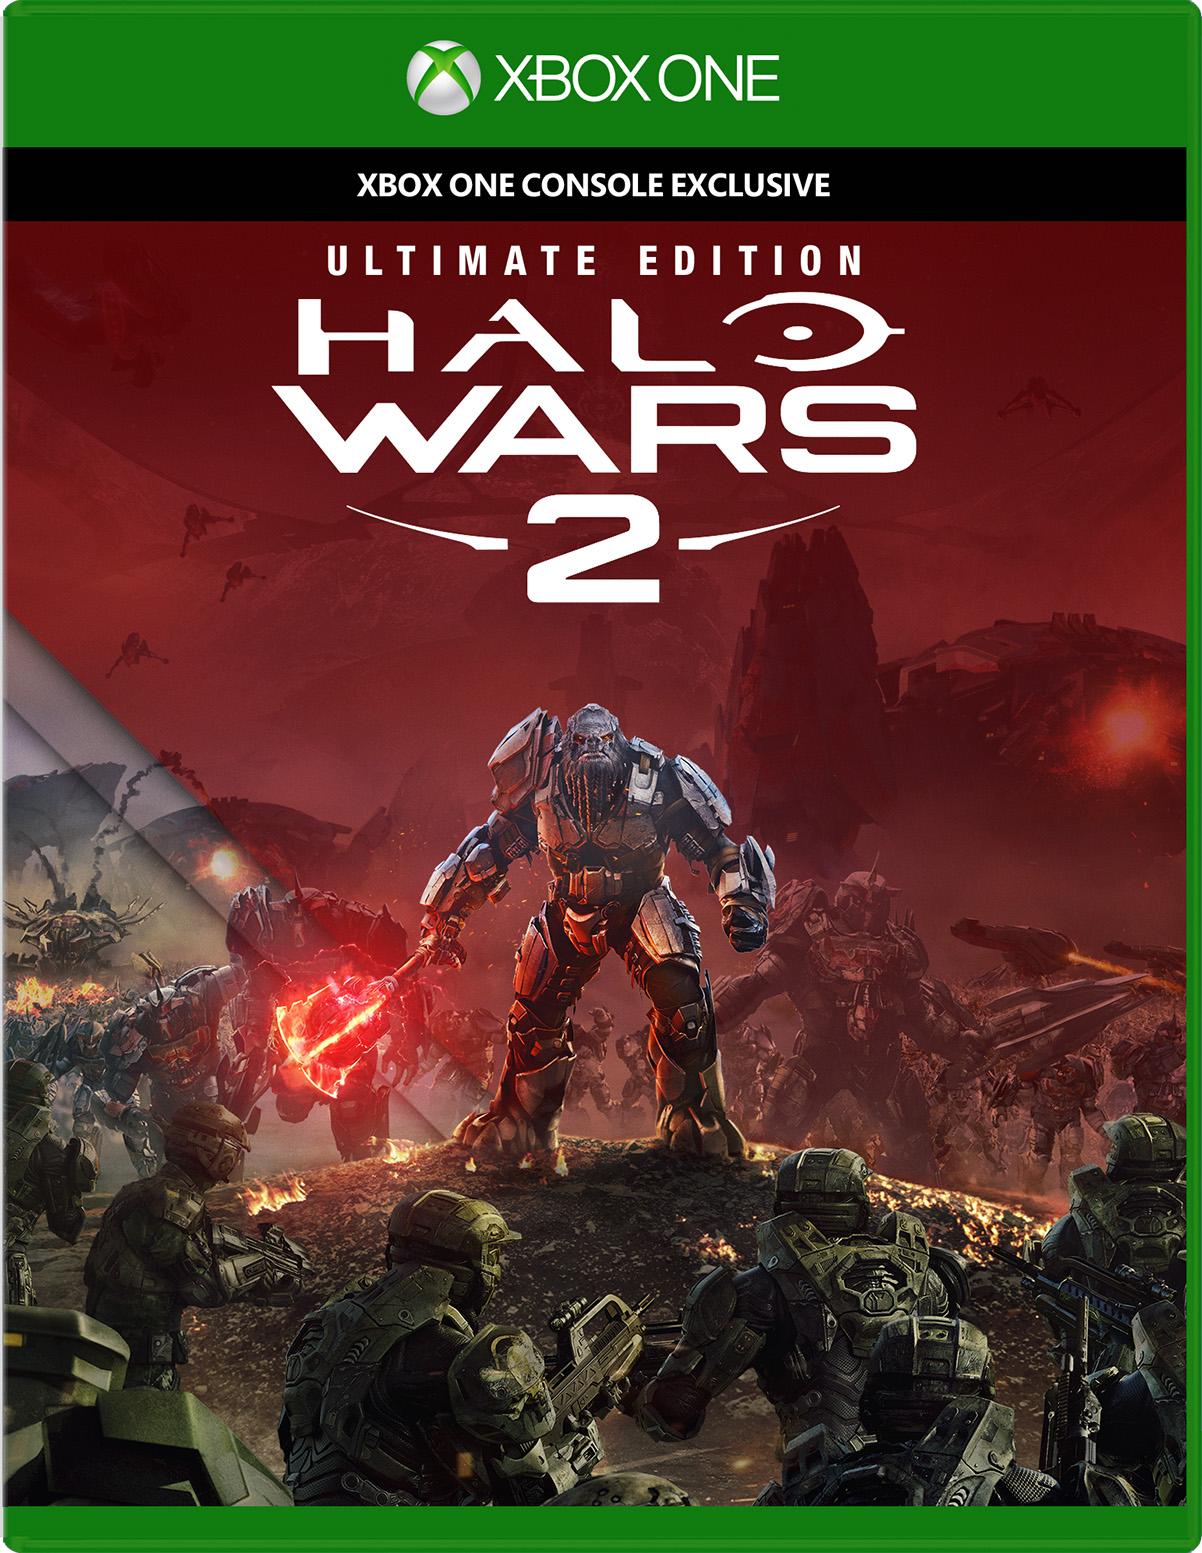 Halo Wars 2 Ultimate Edition